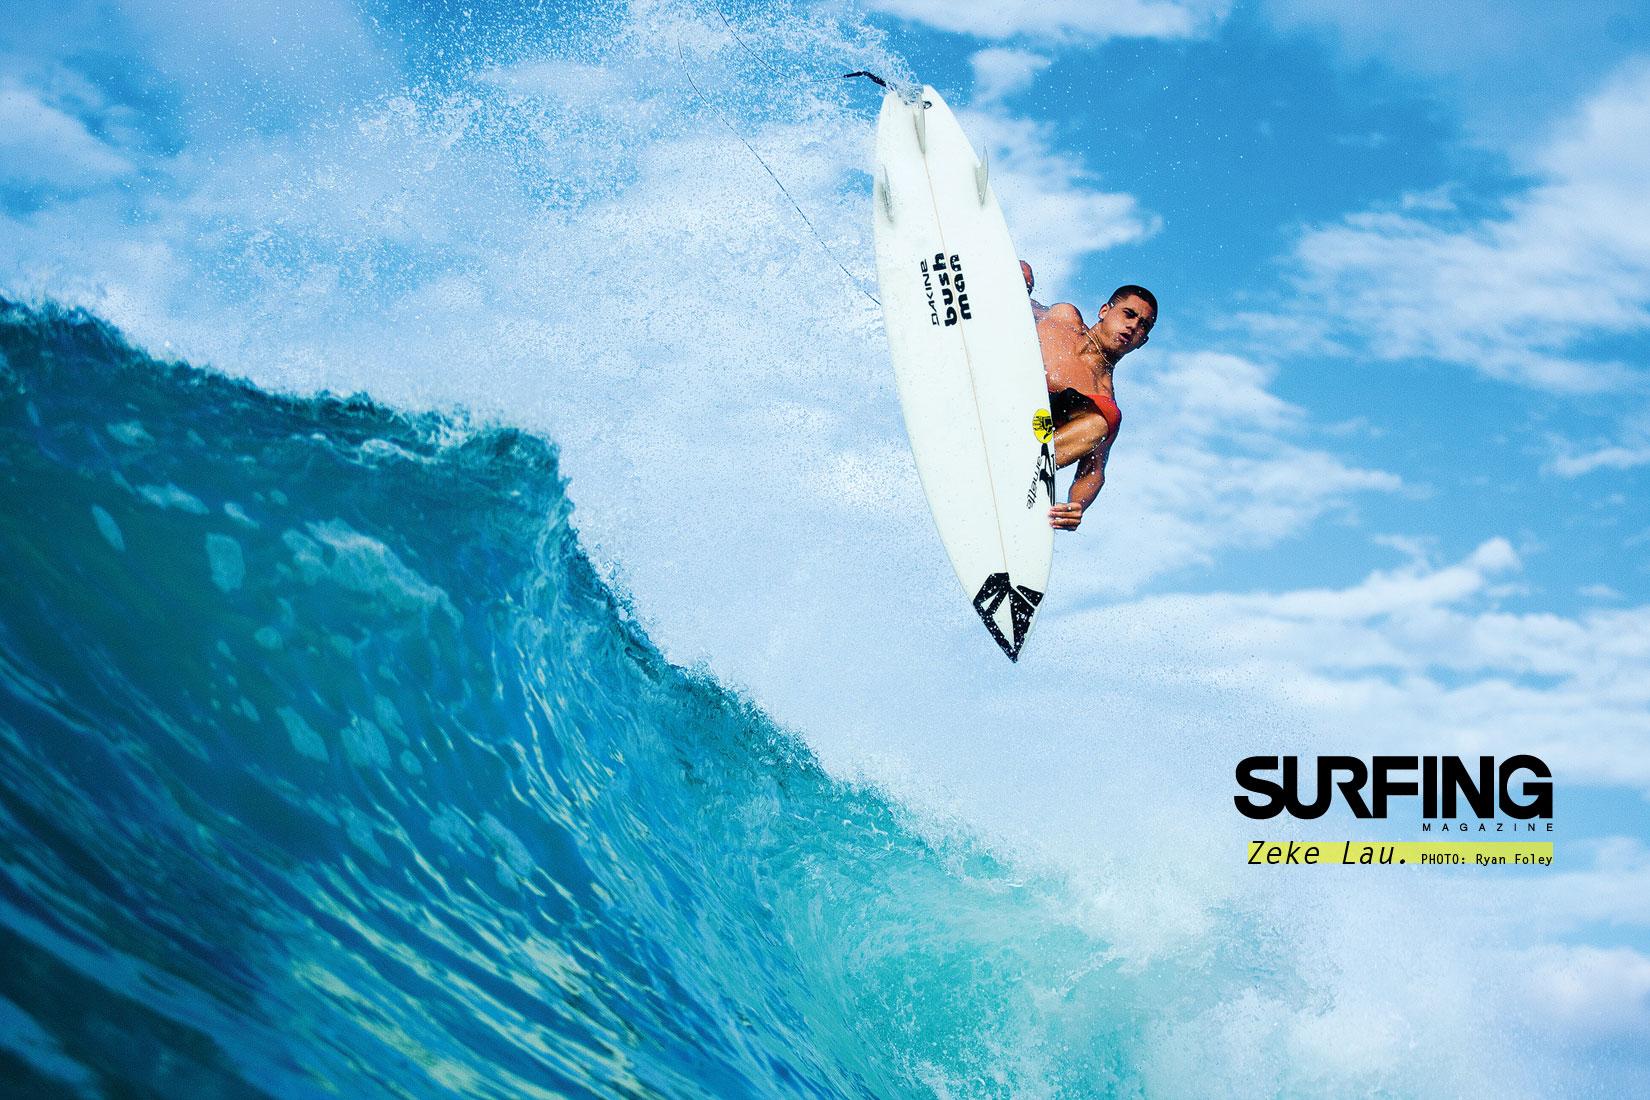 foley surf wallpaper 610x406 Surfing Magazine April Surf Wallpaper 1650x1100